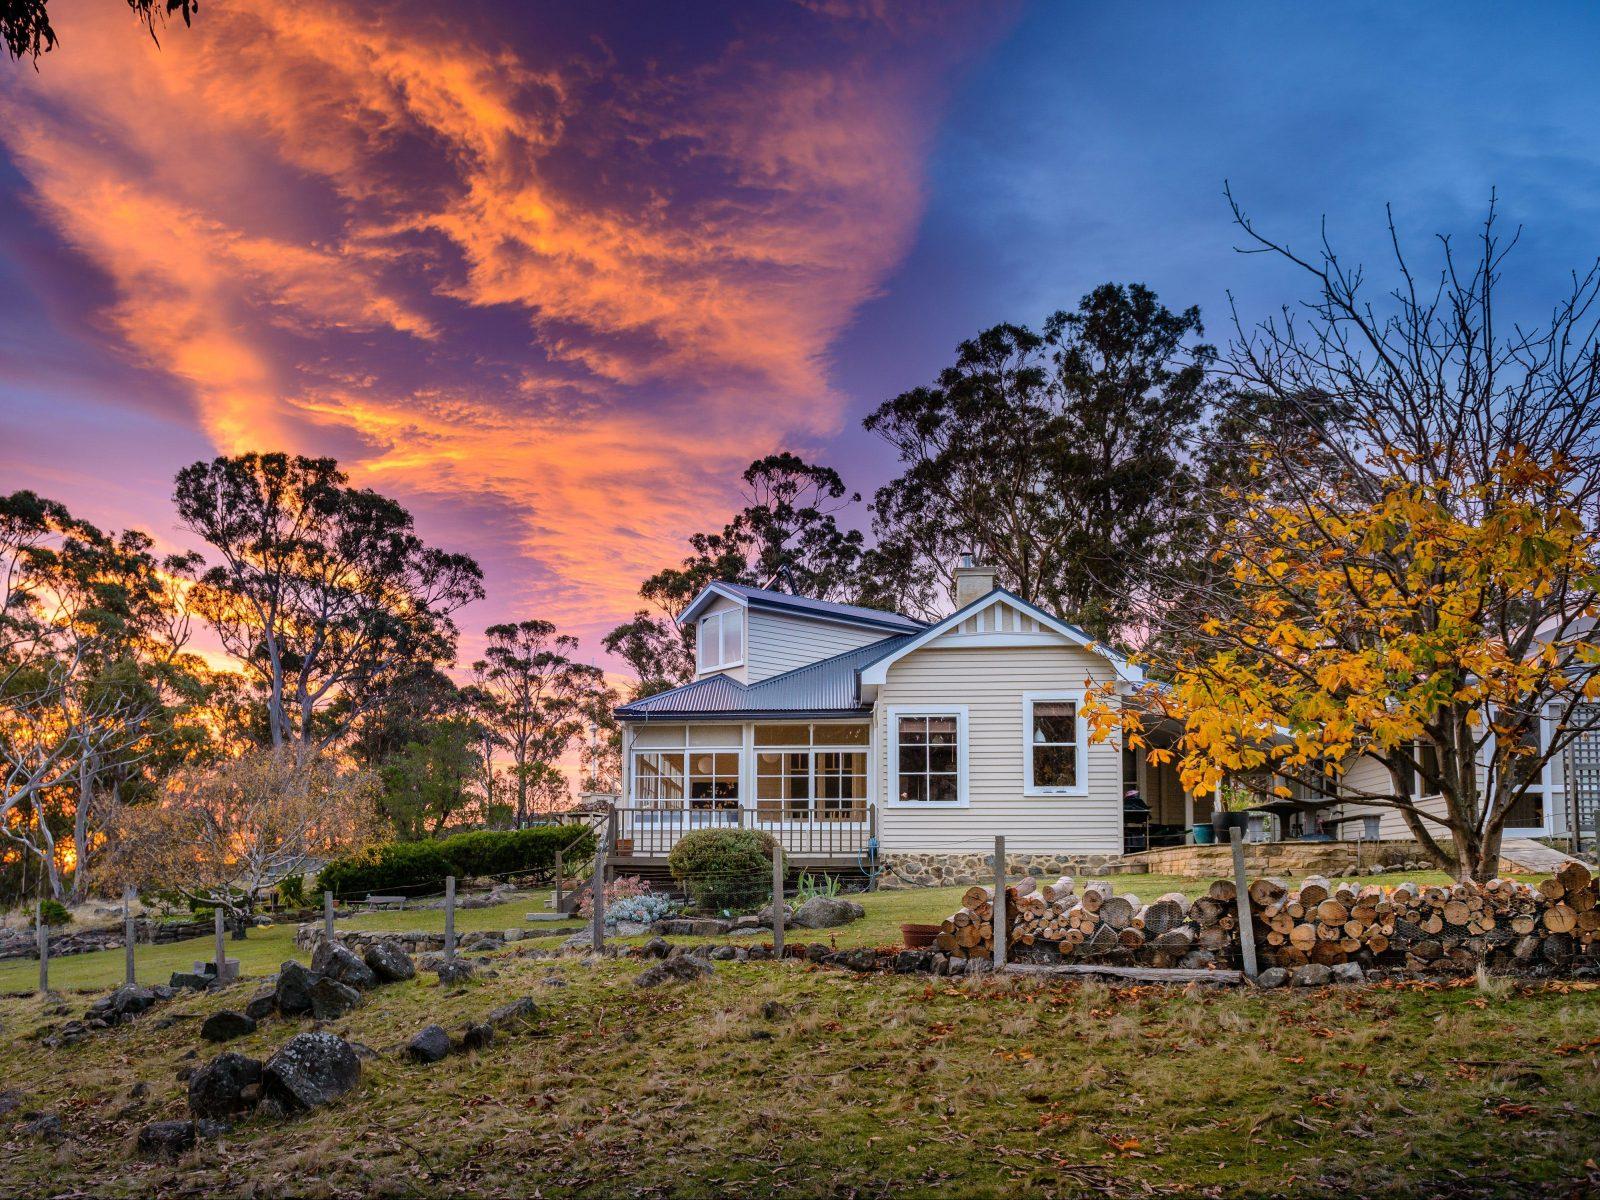 Sunrise over the Signalman's Cottage